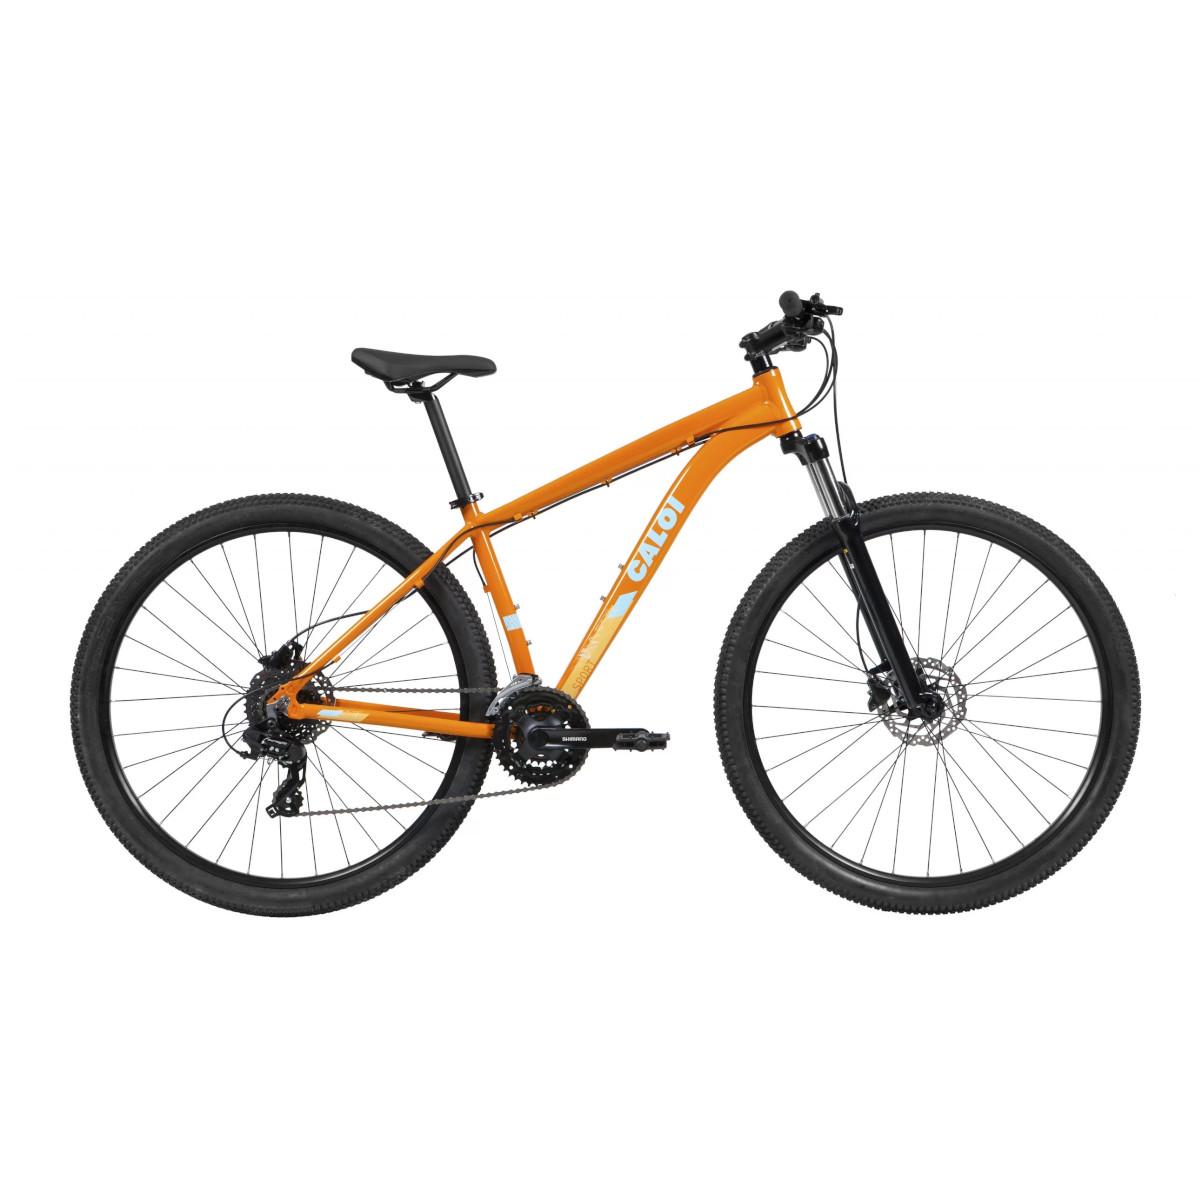 Bicicleta Caloi  Explorer Sport 2021 - Hidraulico  Amarelo